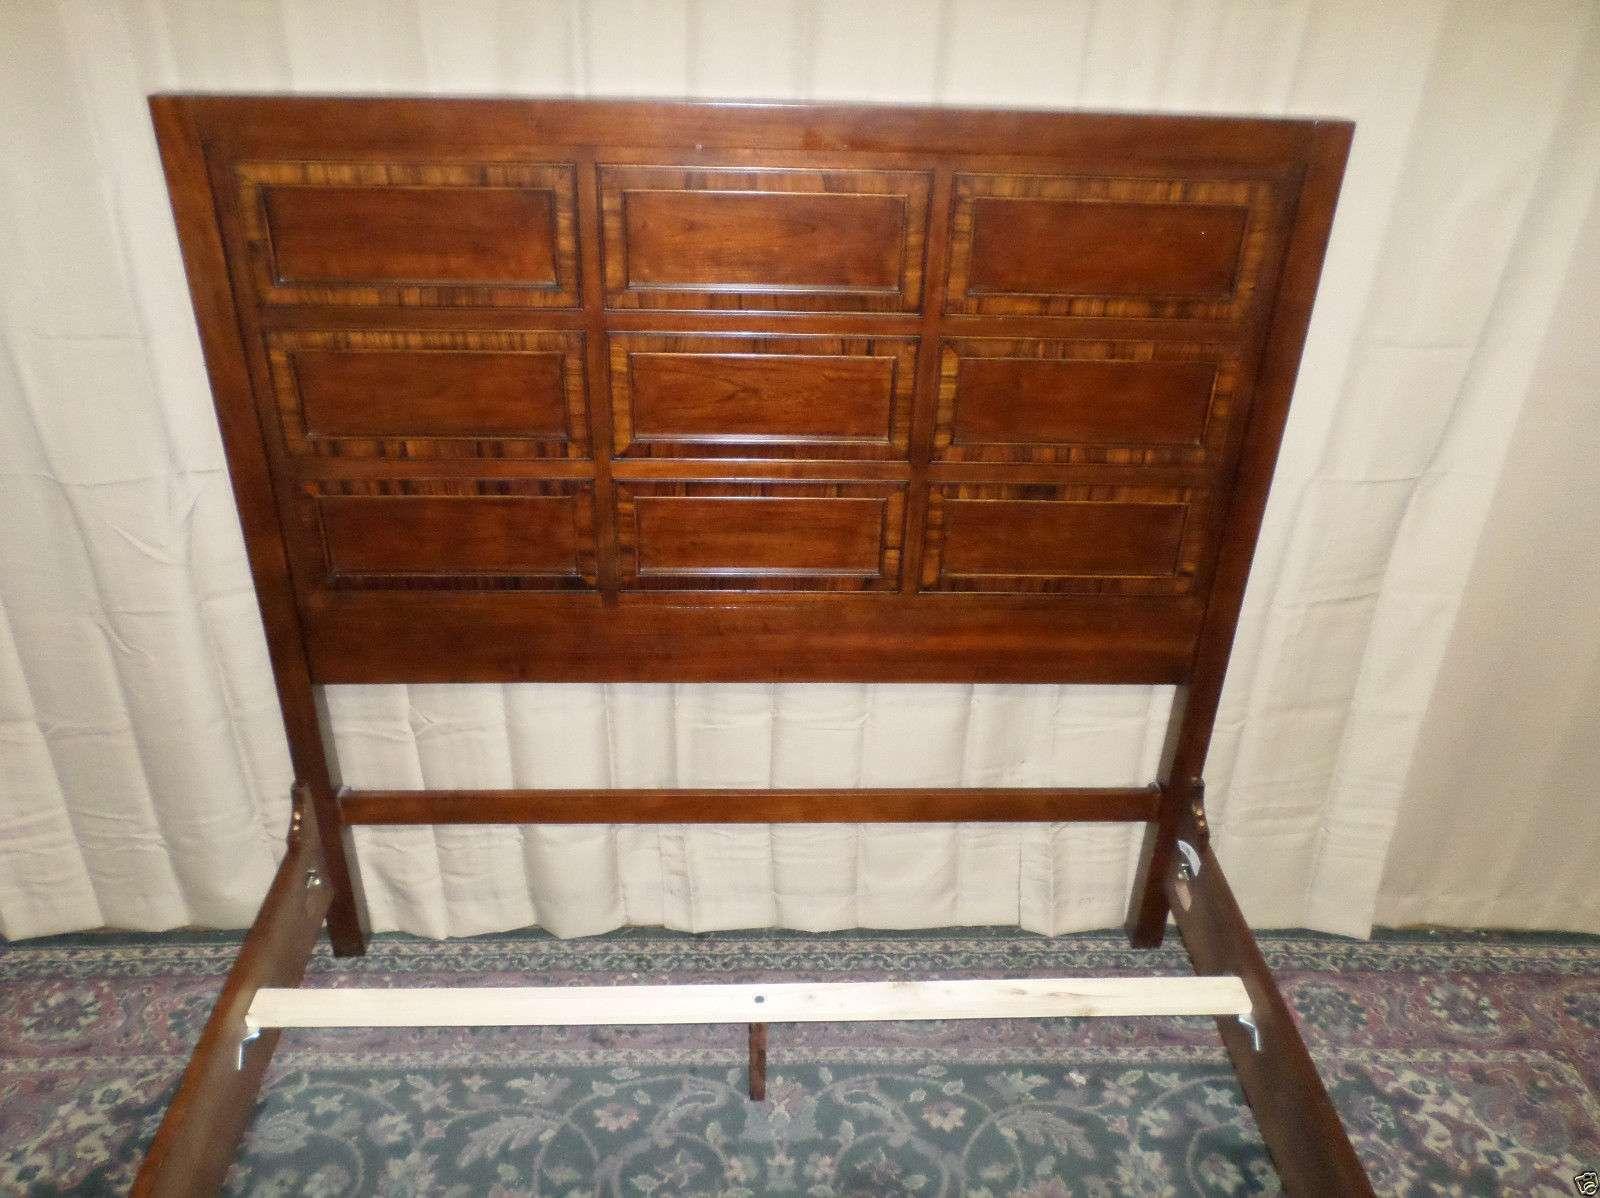 Mahogany Paneled Queen Bed Headboard Footboard Side Rails Slats